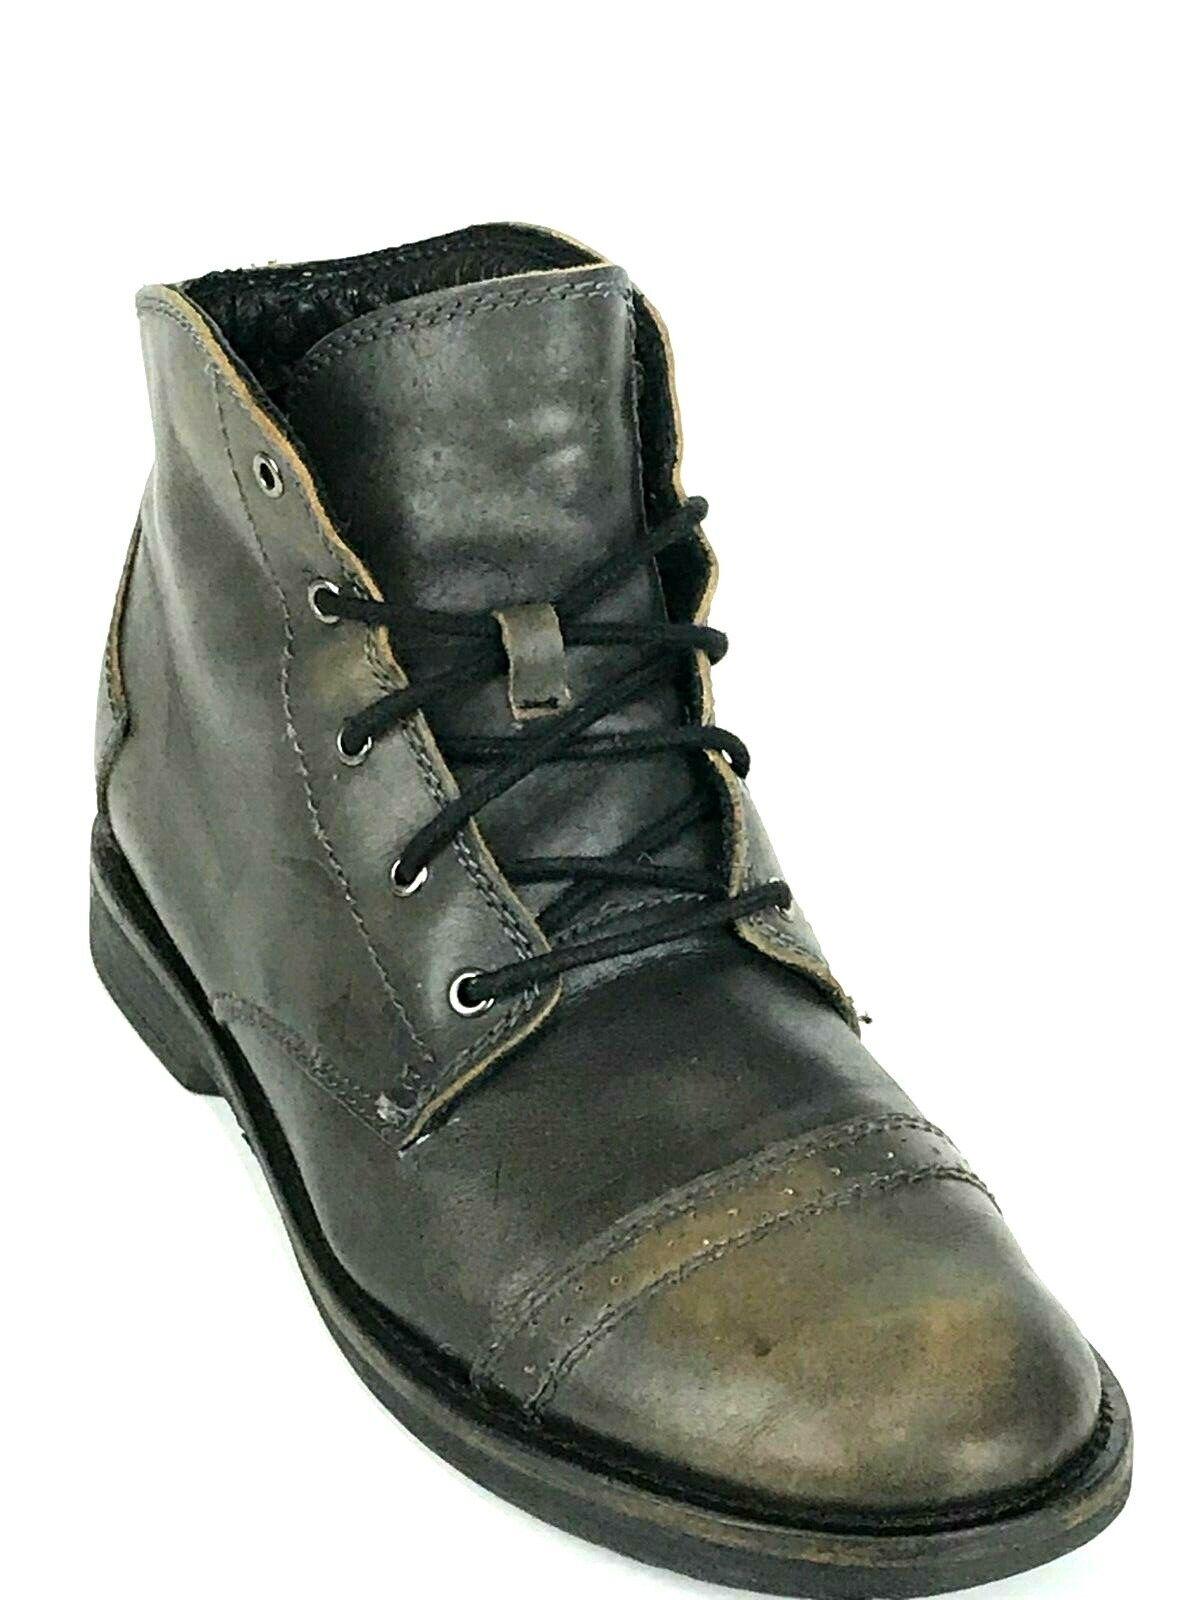 Bed Stu Men's Ankle Boots Grey Size US.11- UK.10 -EU.44